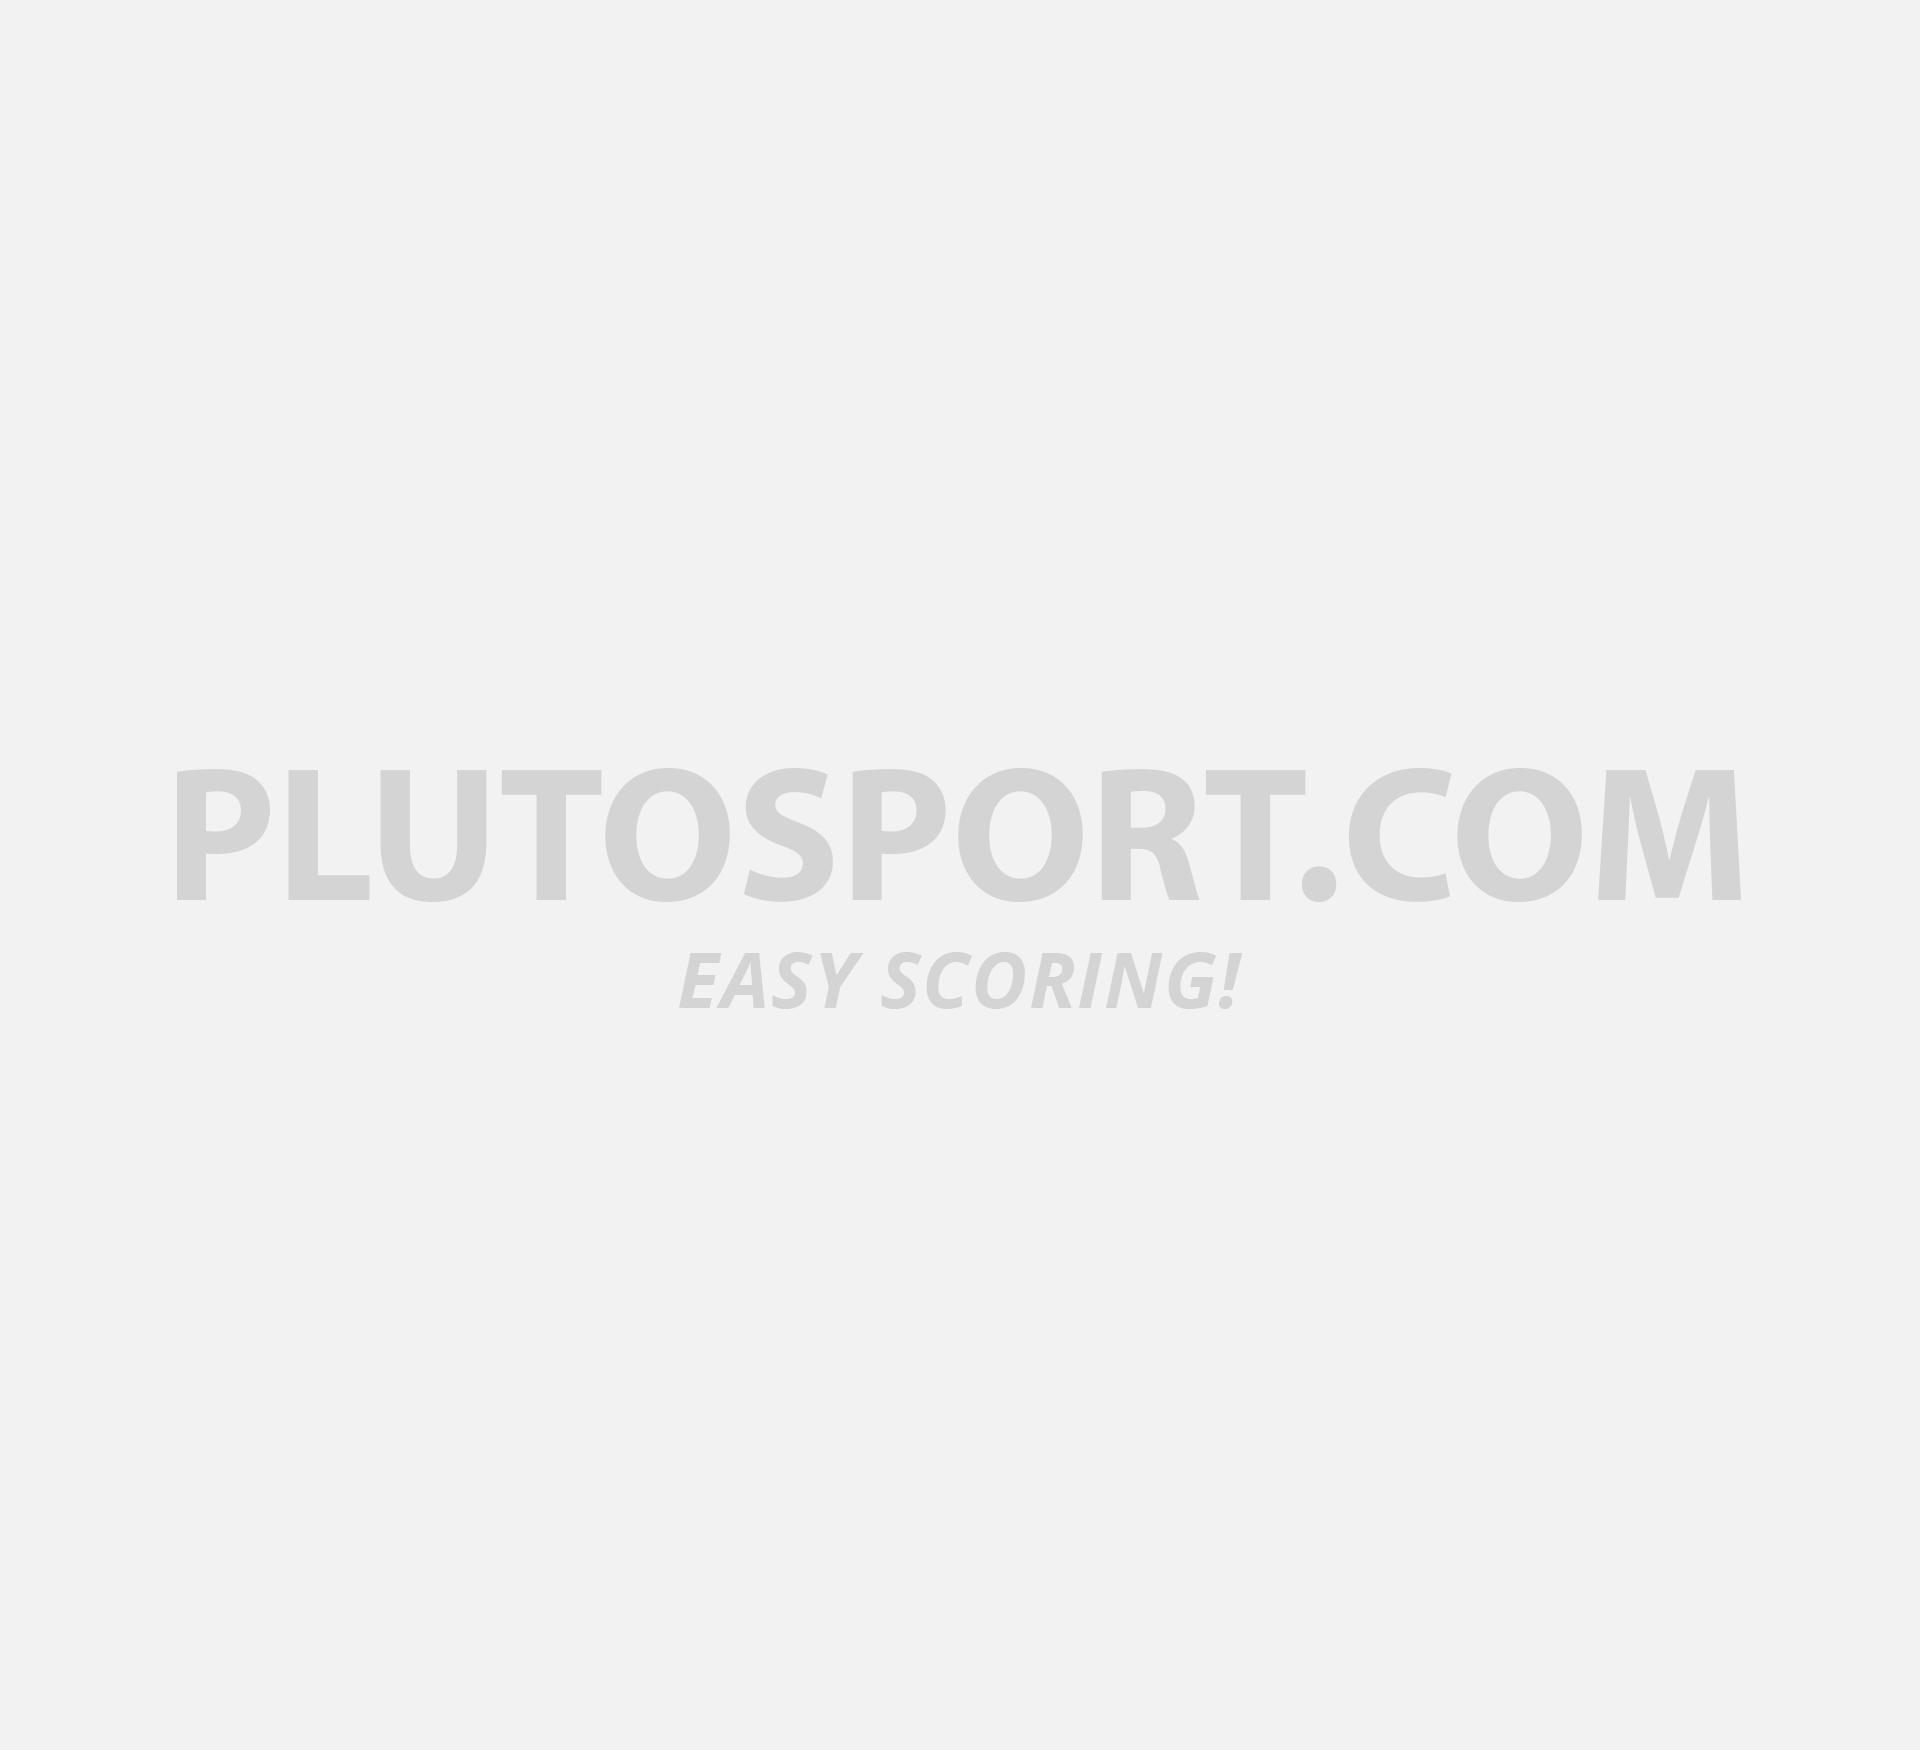 296d3a98 Lacoste Men's Sport Color Block Tennis Polo Roland Garros - Polo shirts -  Clothing - Tennis - Sports | Plutosport